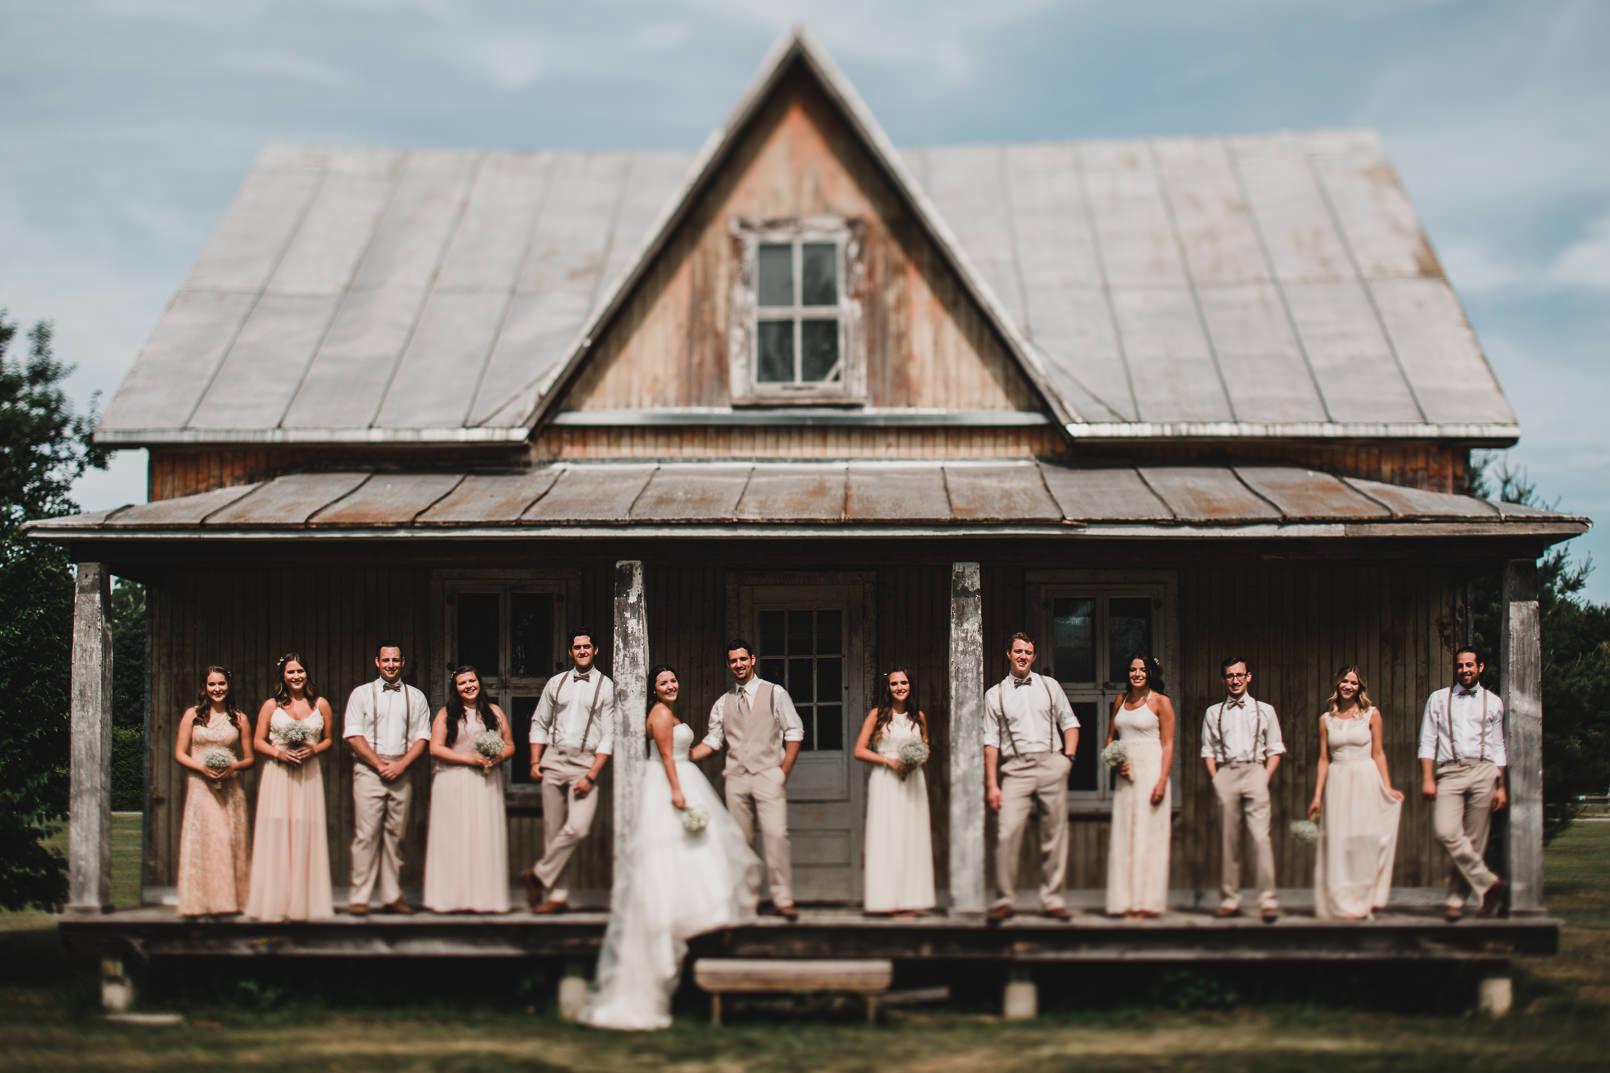 043-Jonathan-Kuhn-Photography-Wedding-_mini.jpg